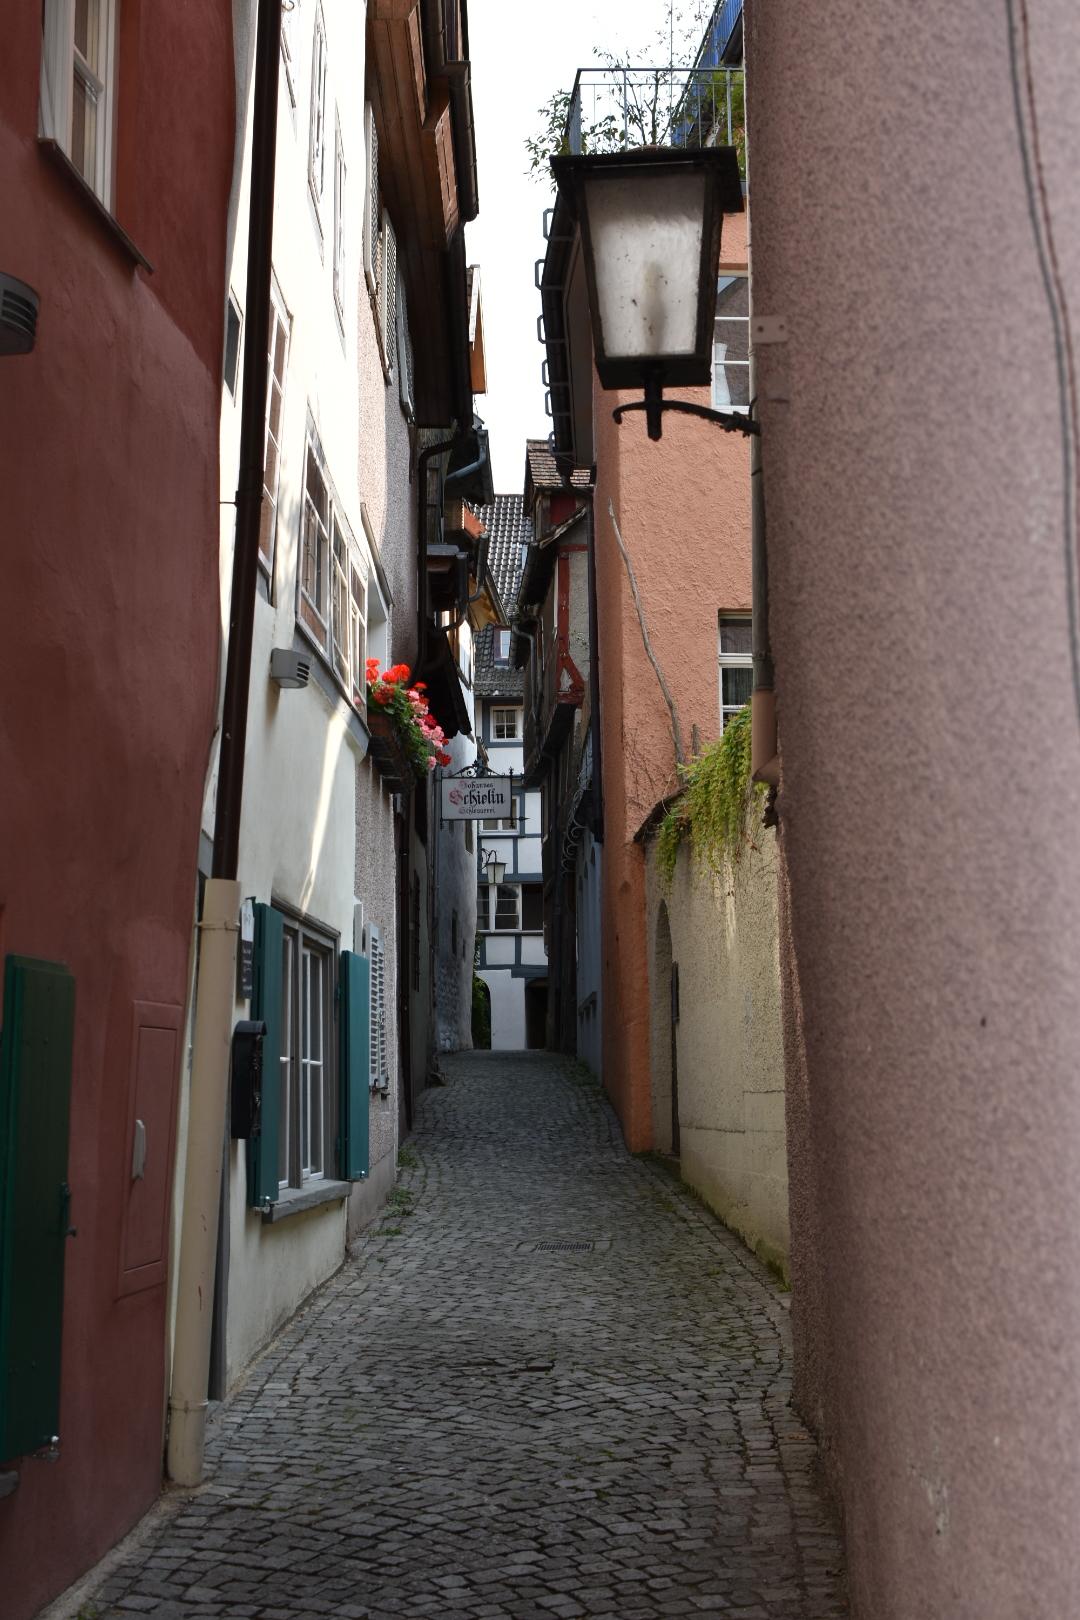 Lindau Germany - The Bucket List Connection